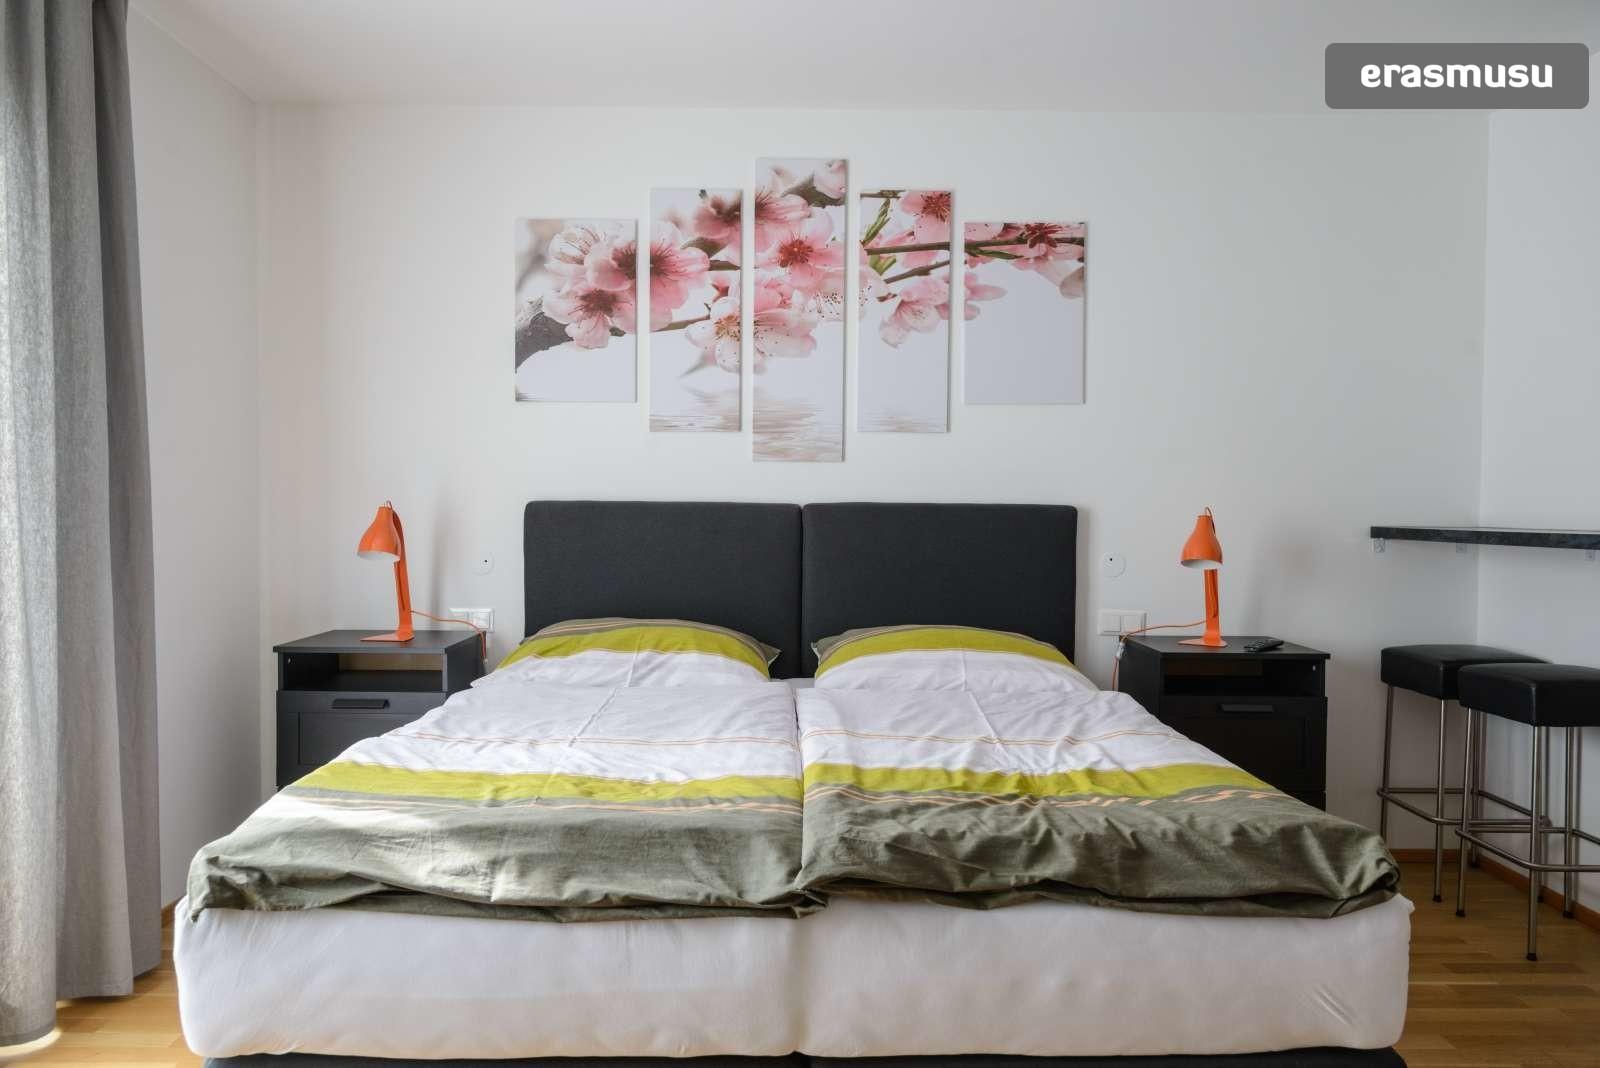 spacious-studio-apartment-rent-aspern-area-donaustadt-8716ec882d